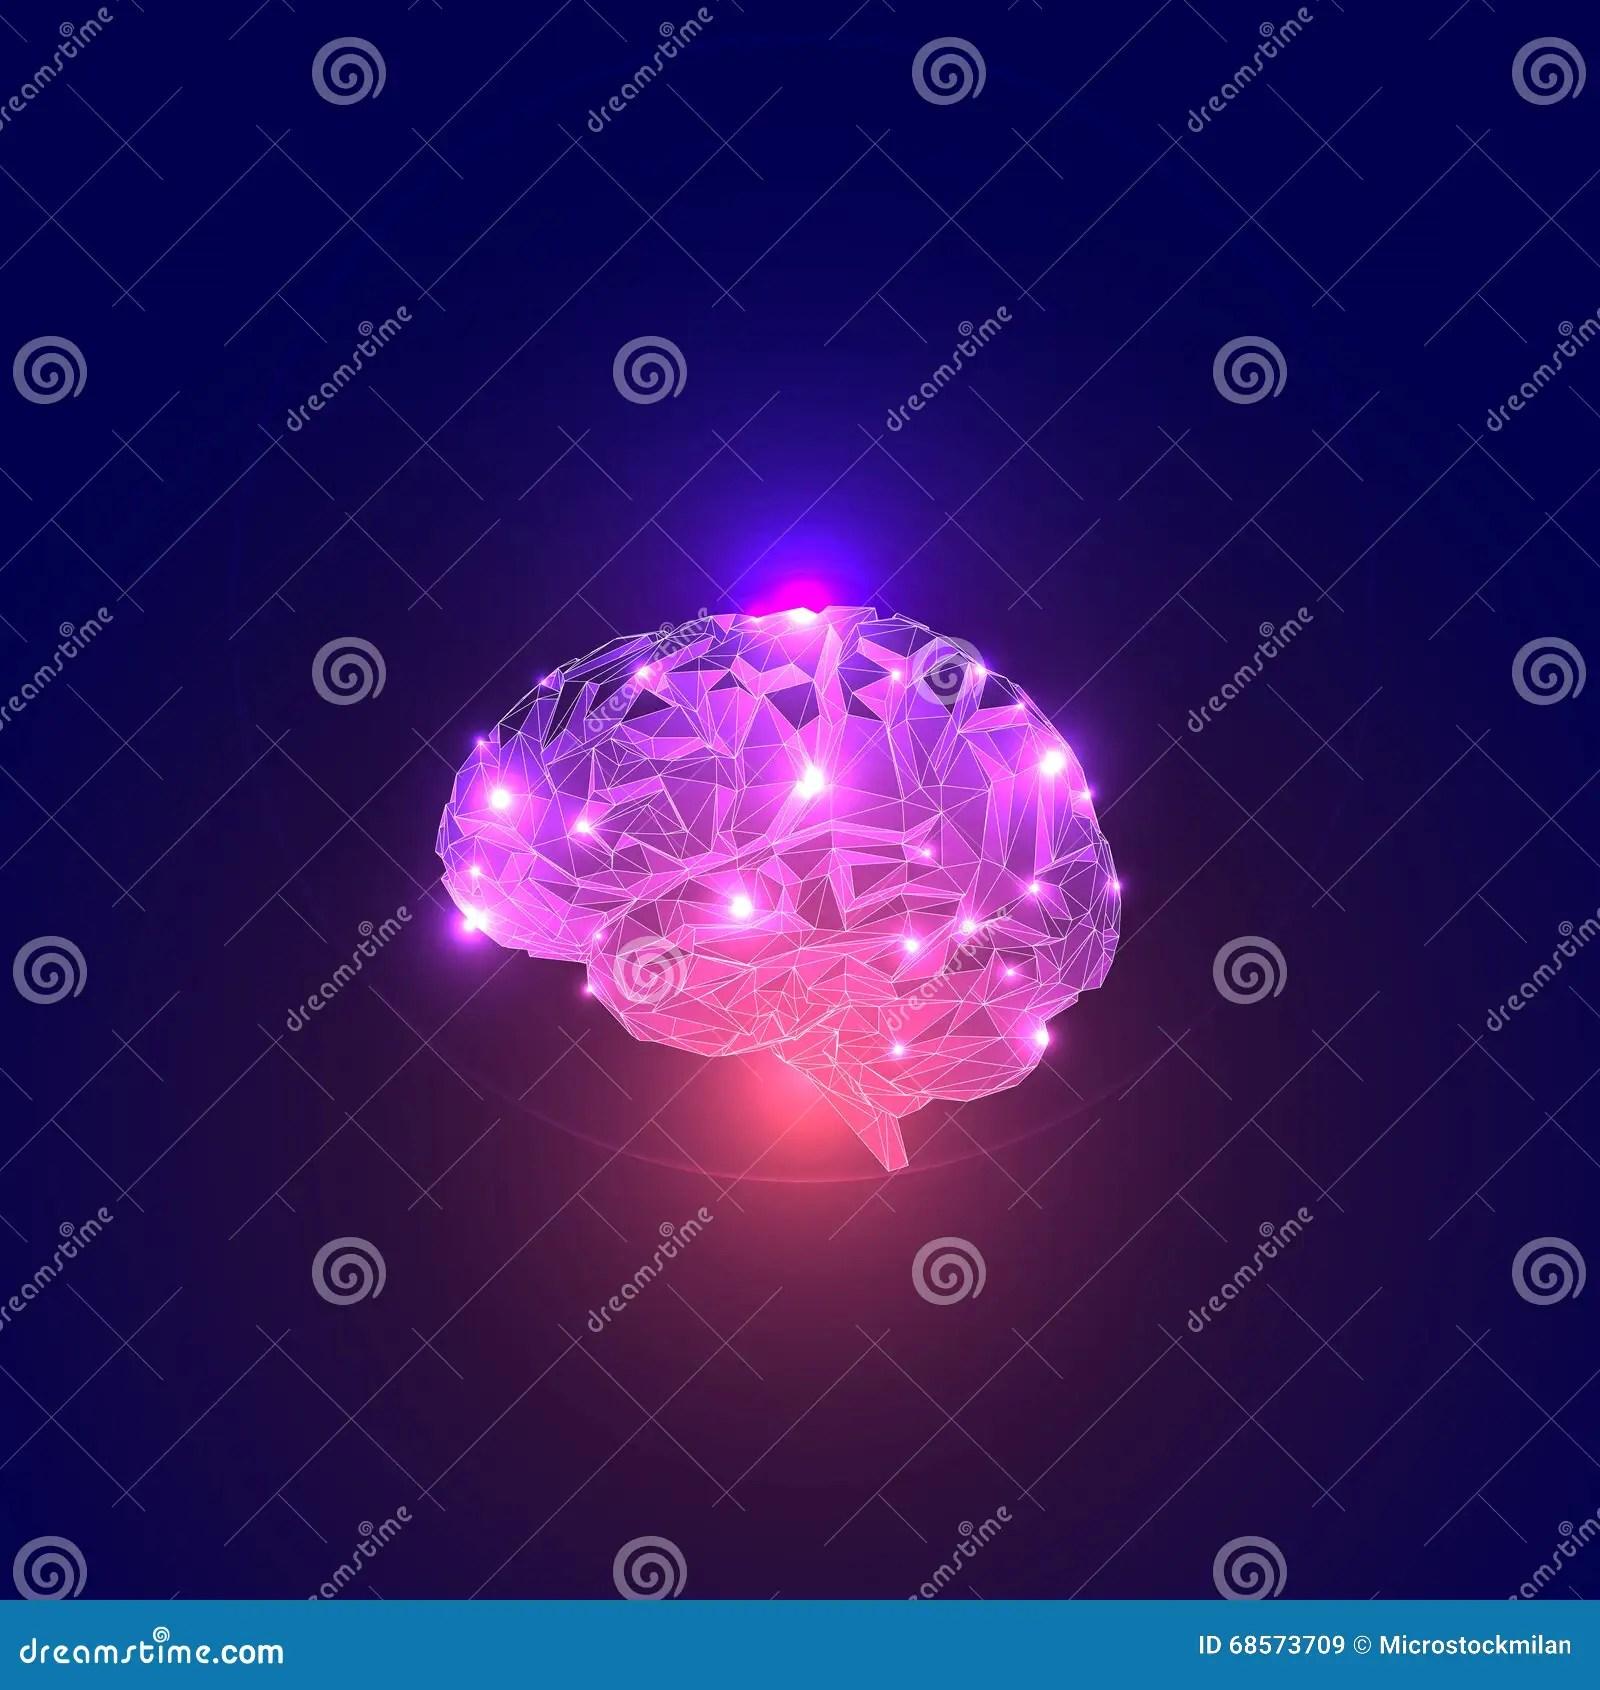 Abstract Concept Of Human Brain Activity Cartoon Vector